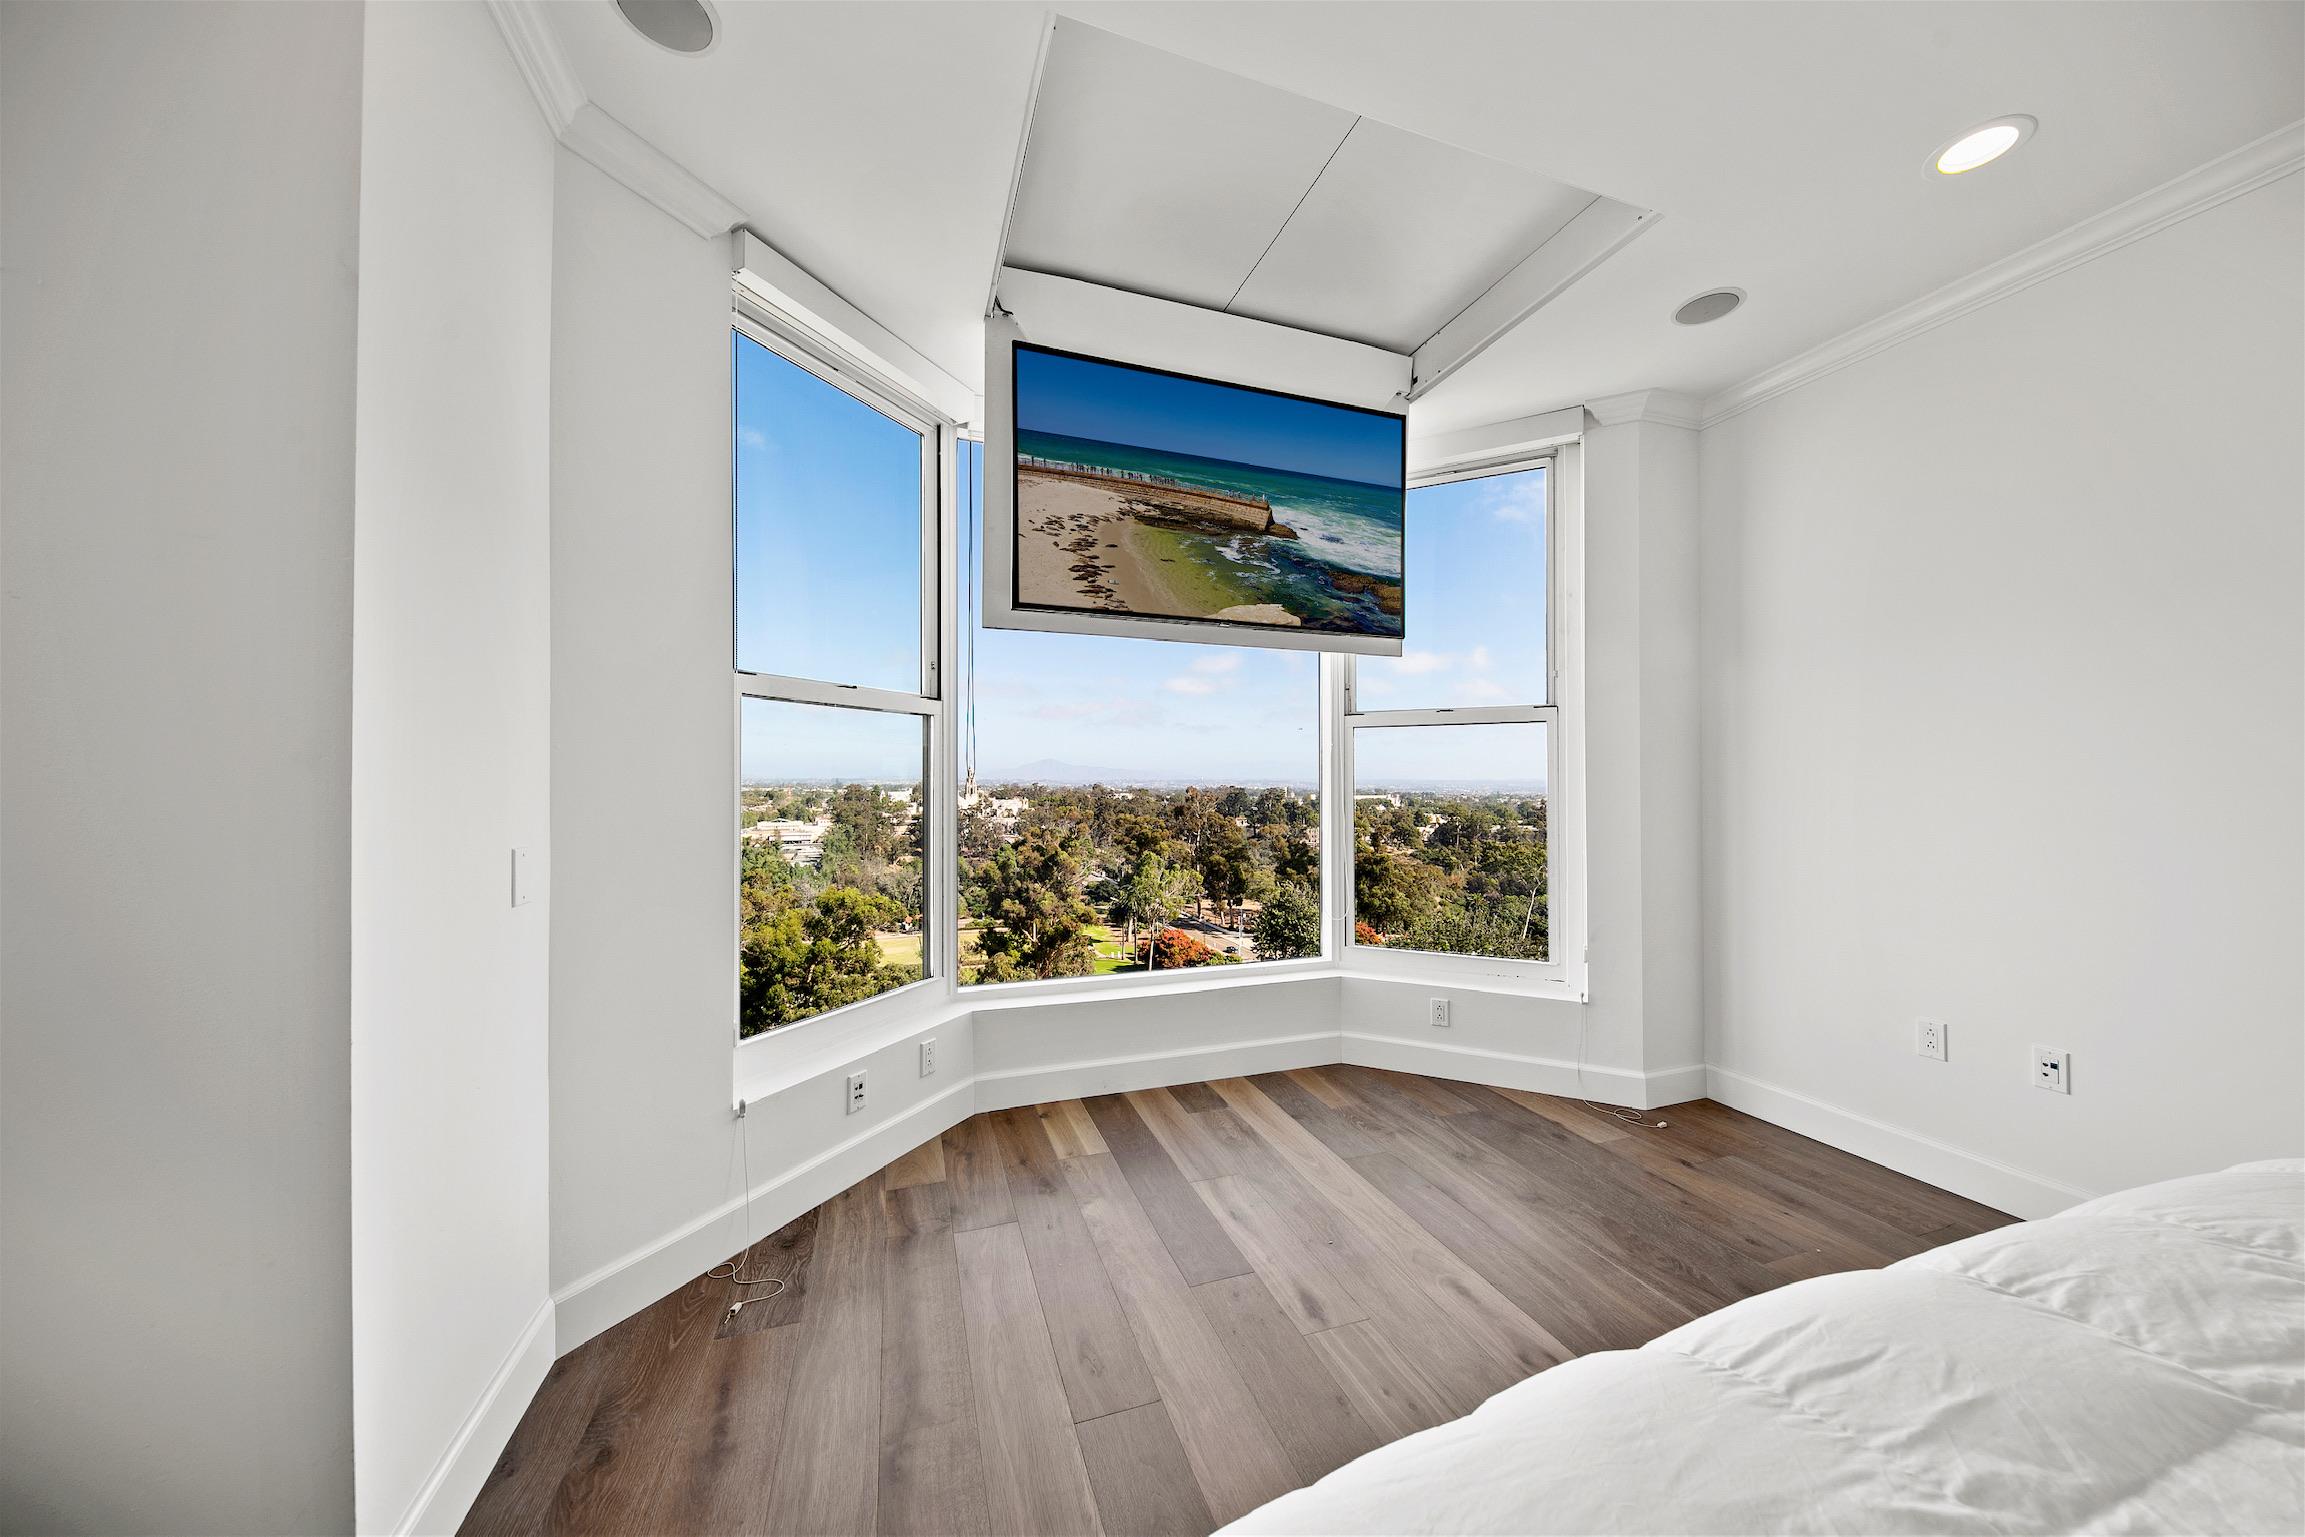 5th Avenue Master Bedroom